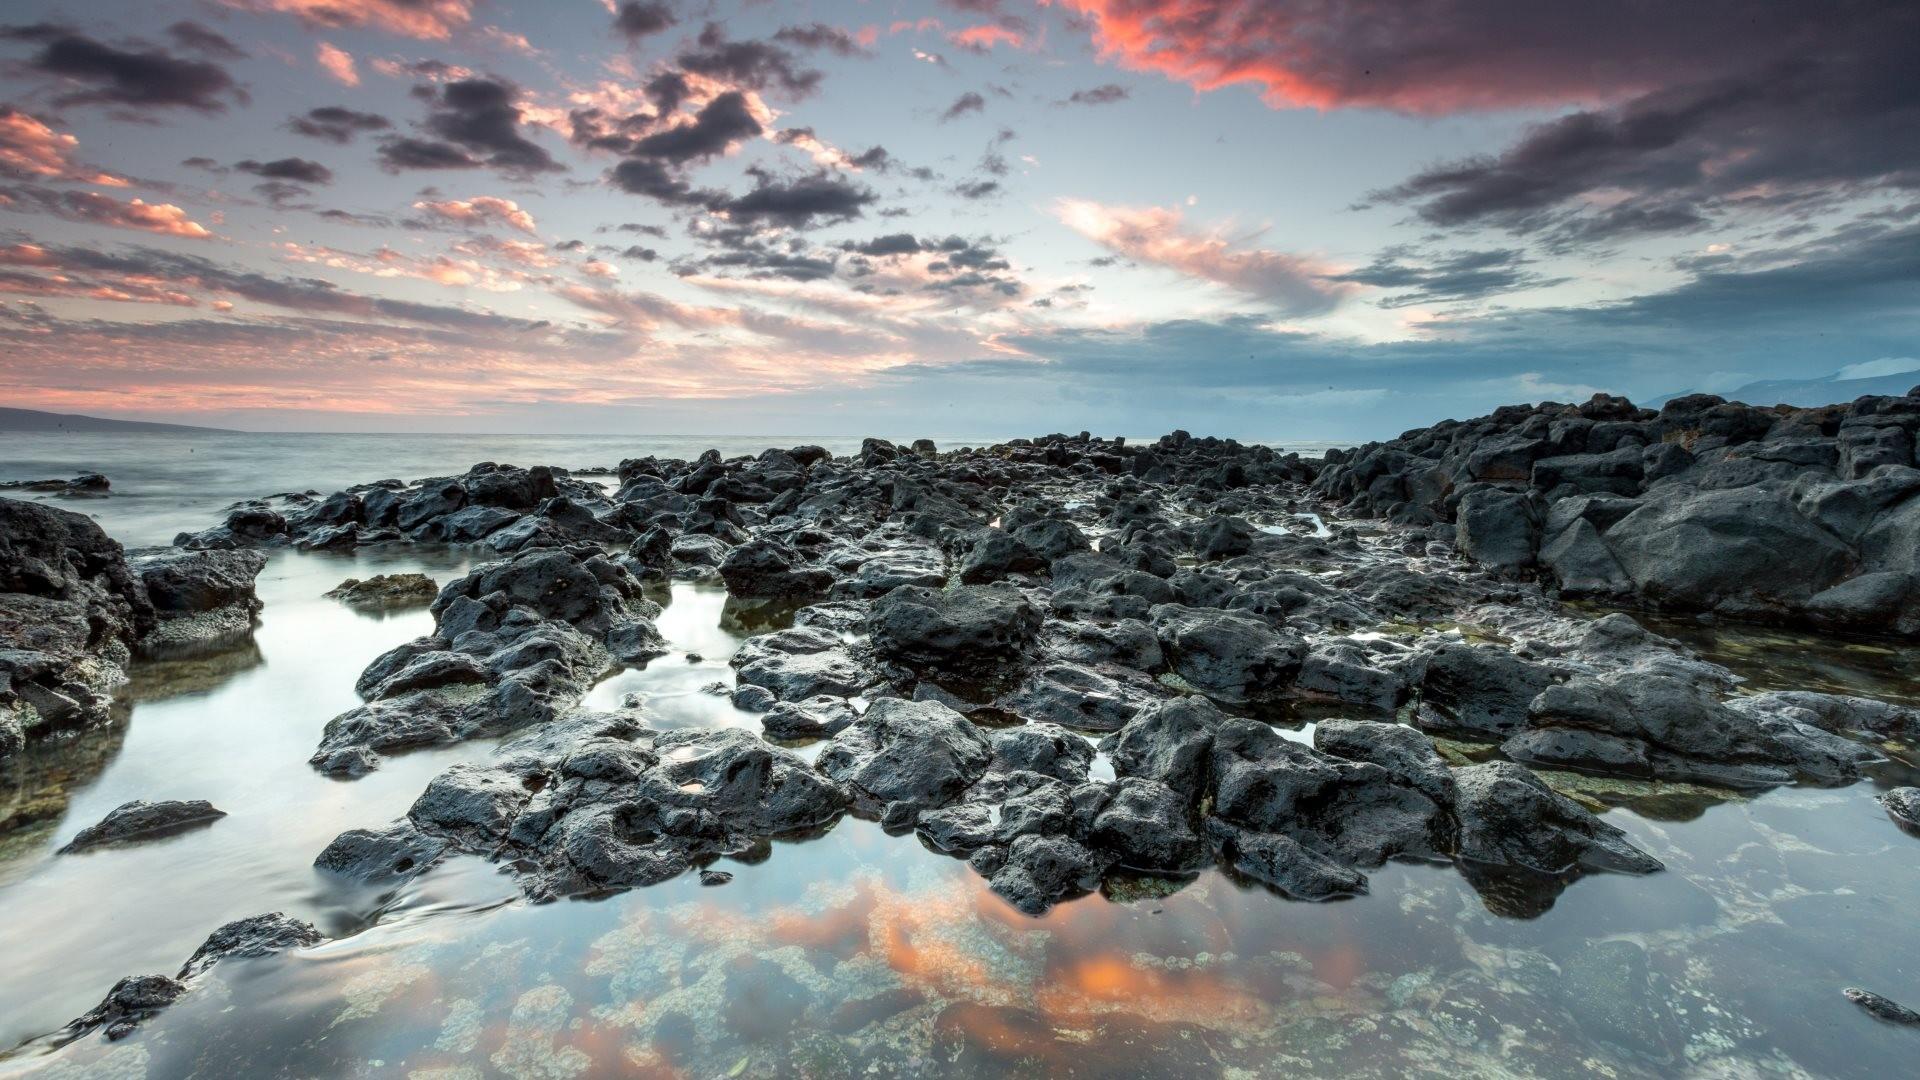 4K HD Wallpaper: Rocks, shore, skyline at Këökea Ahupua'a